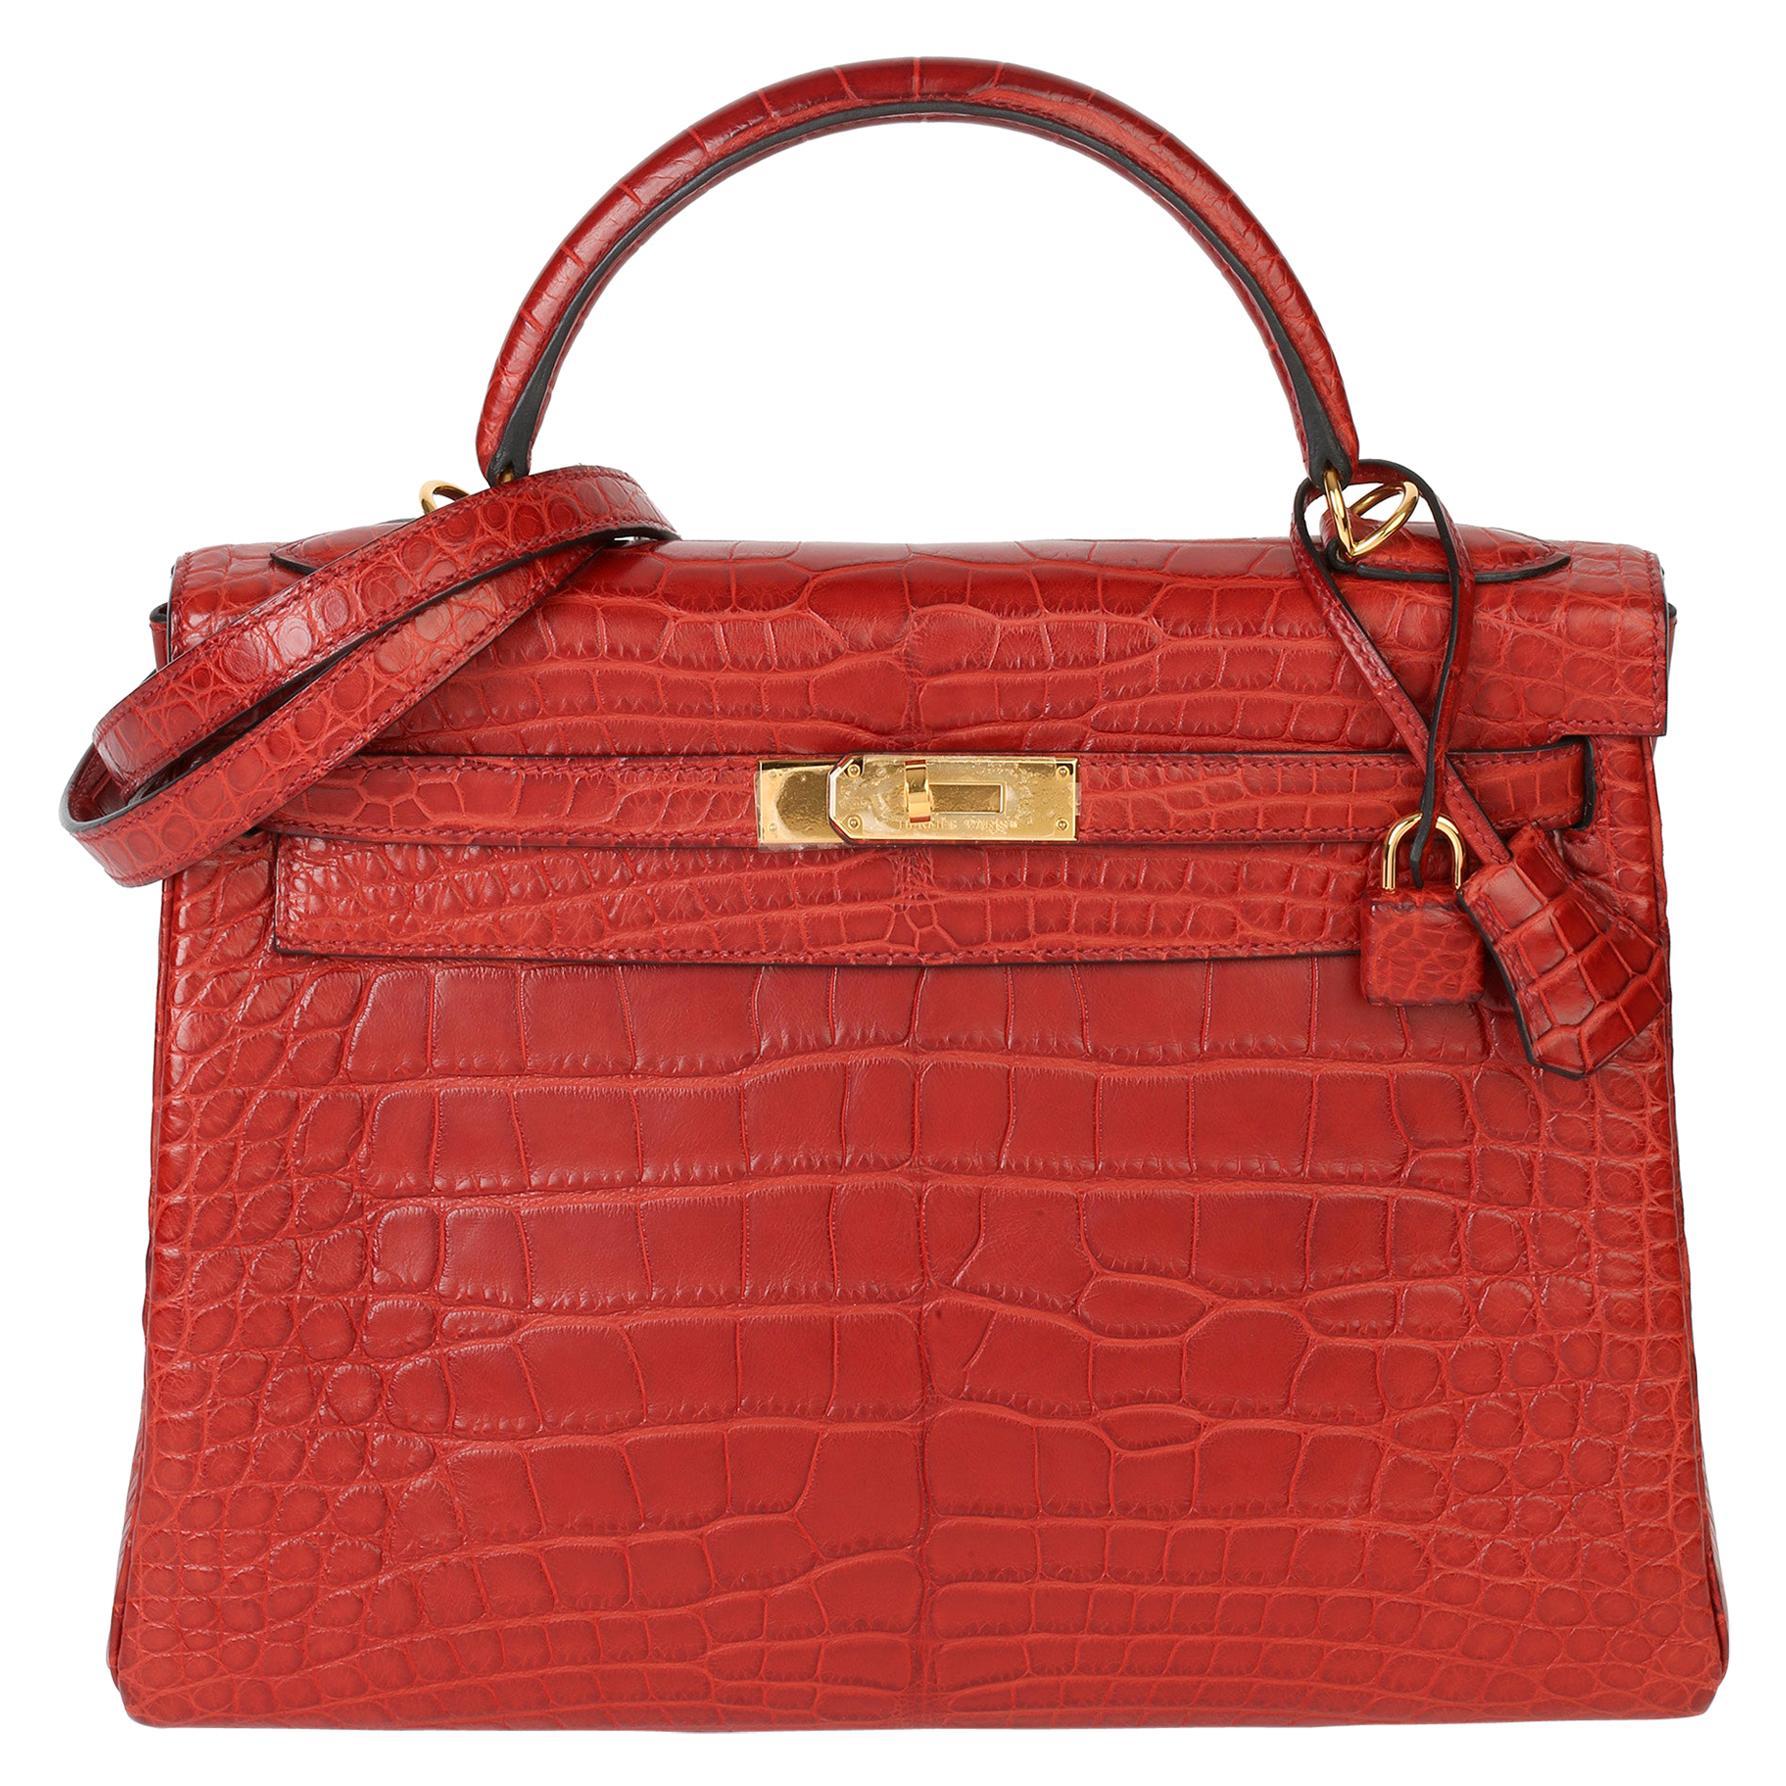 Hermès Rouge H Matte Mississippiensis Alligator Leather Kelly 32cm Retourne